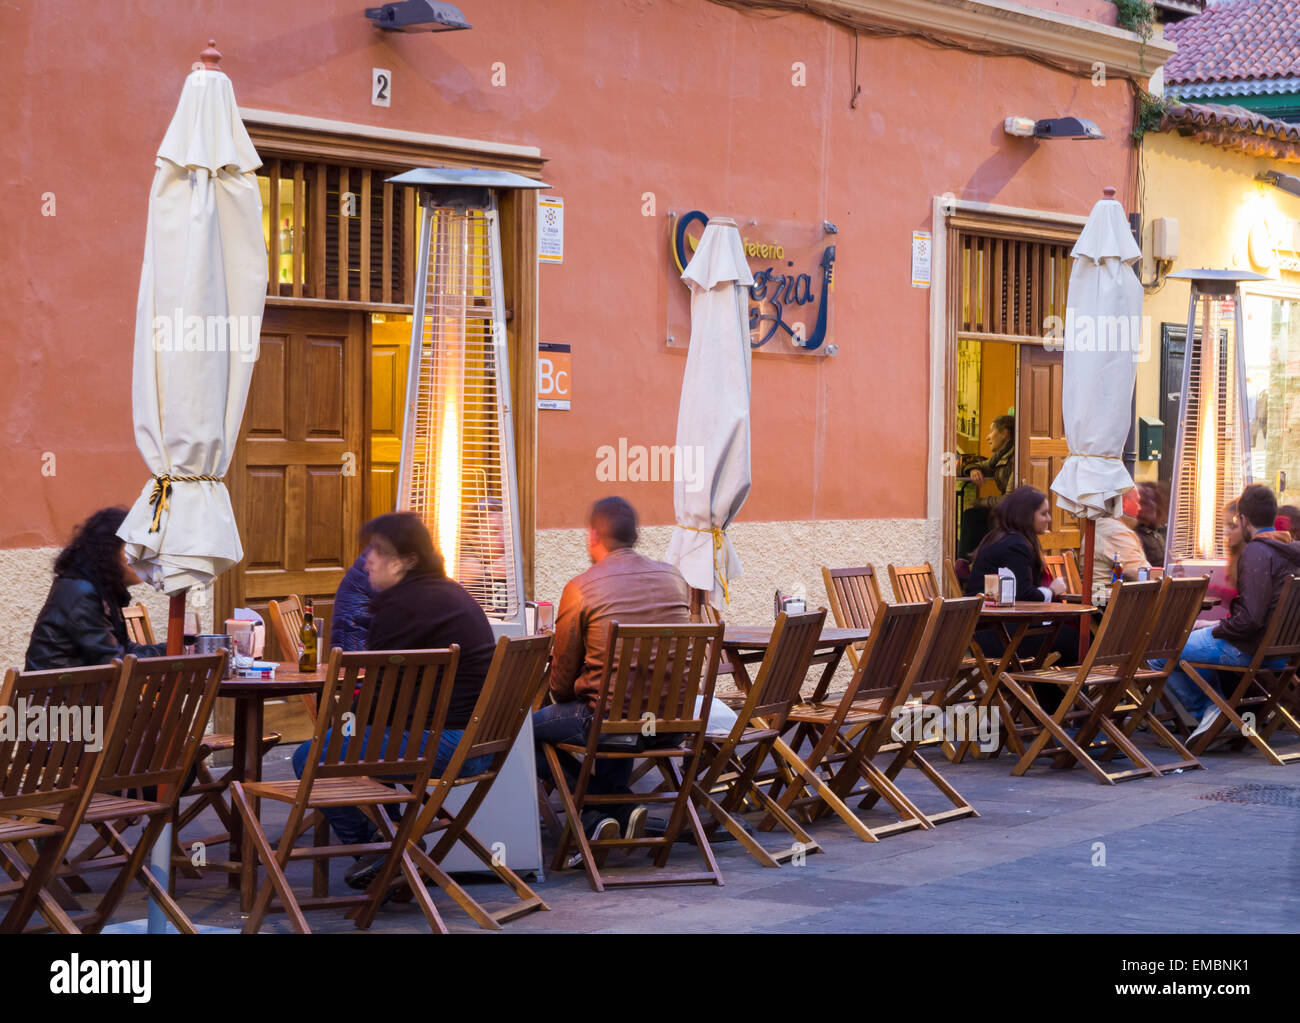 Patio Heaters Outside Street Bar At Night In San Cristobal De La Laguna,  Tenerife, Canary Islands, Spain